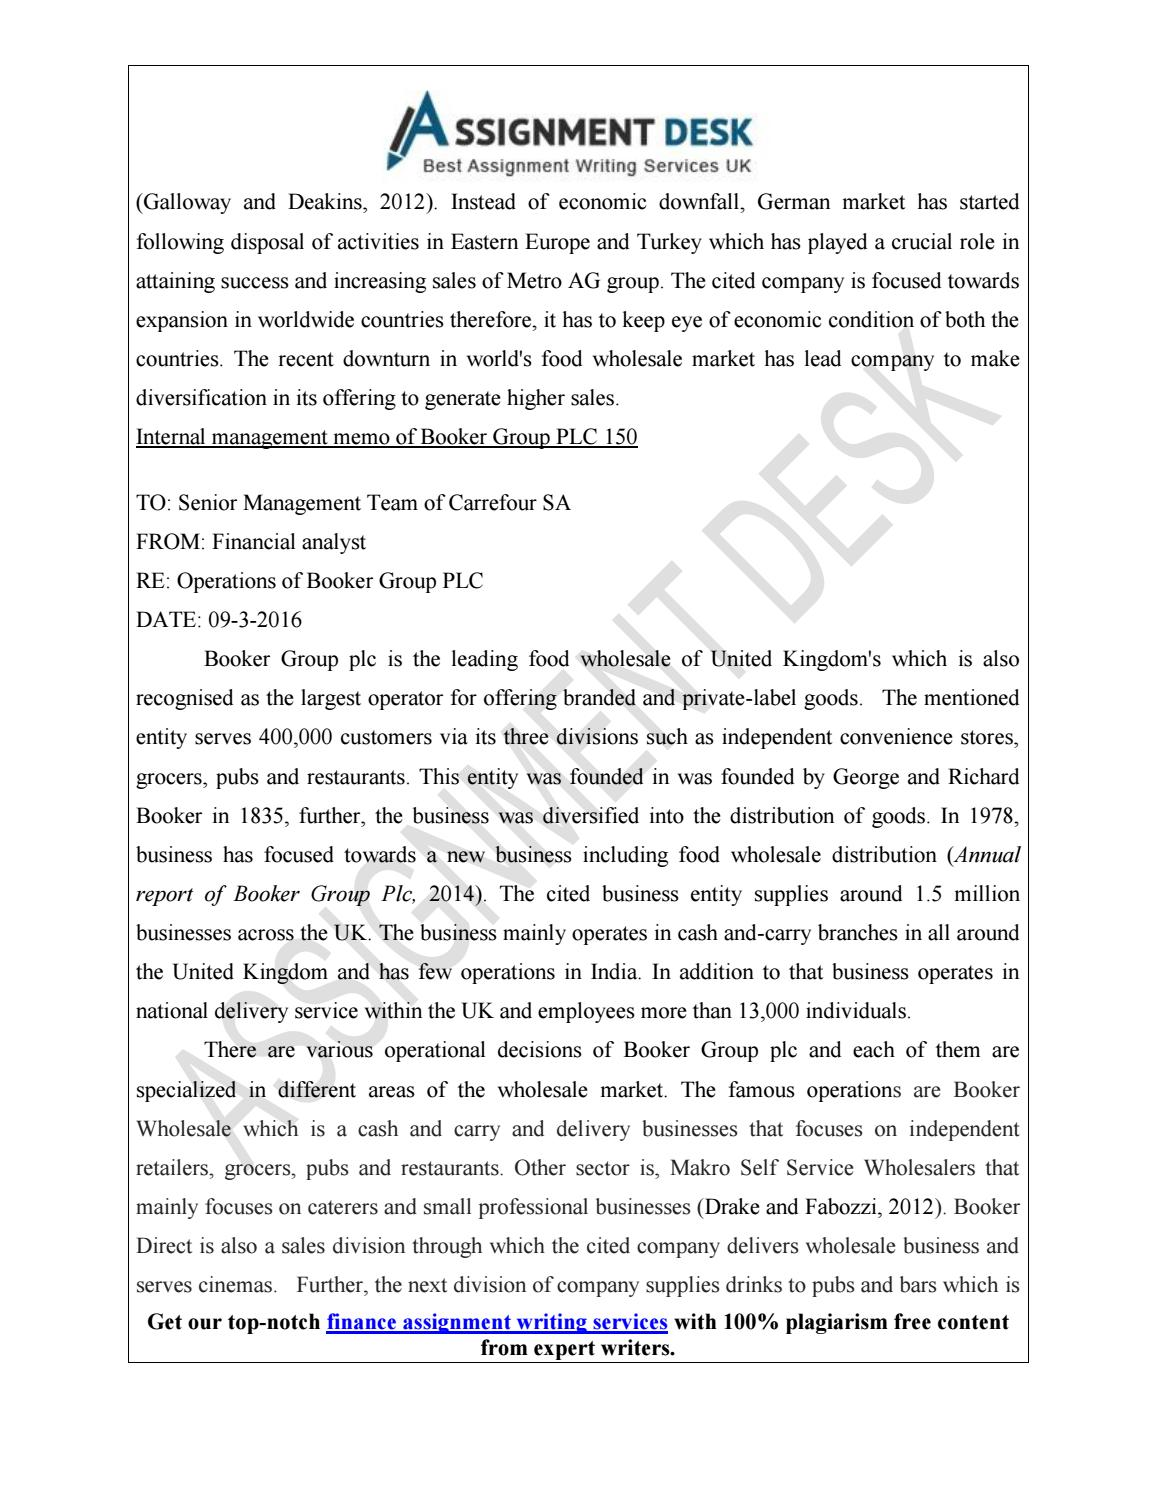 Rhetorical analysis essay ap central